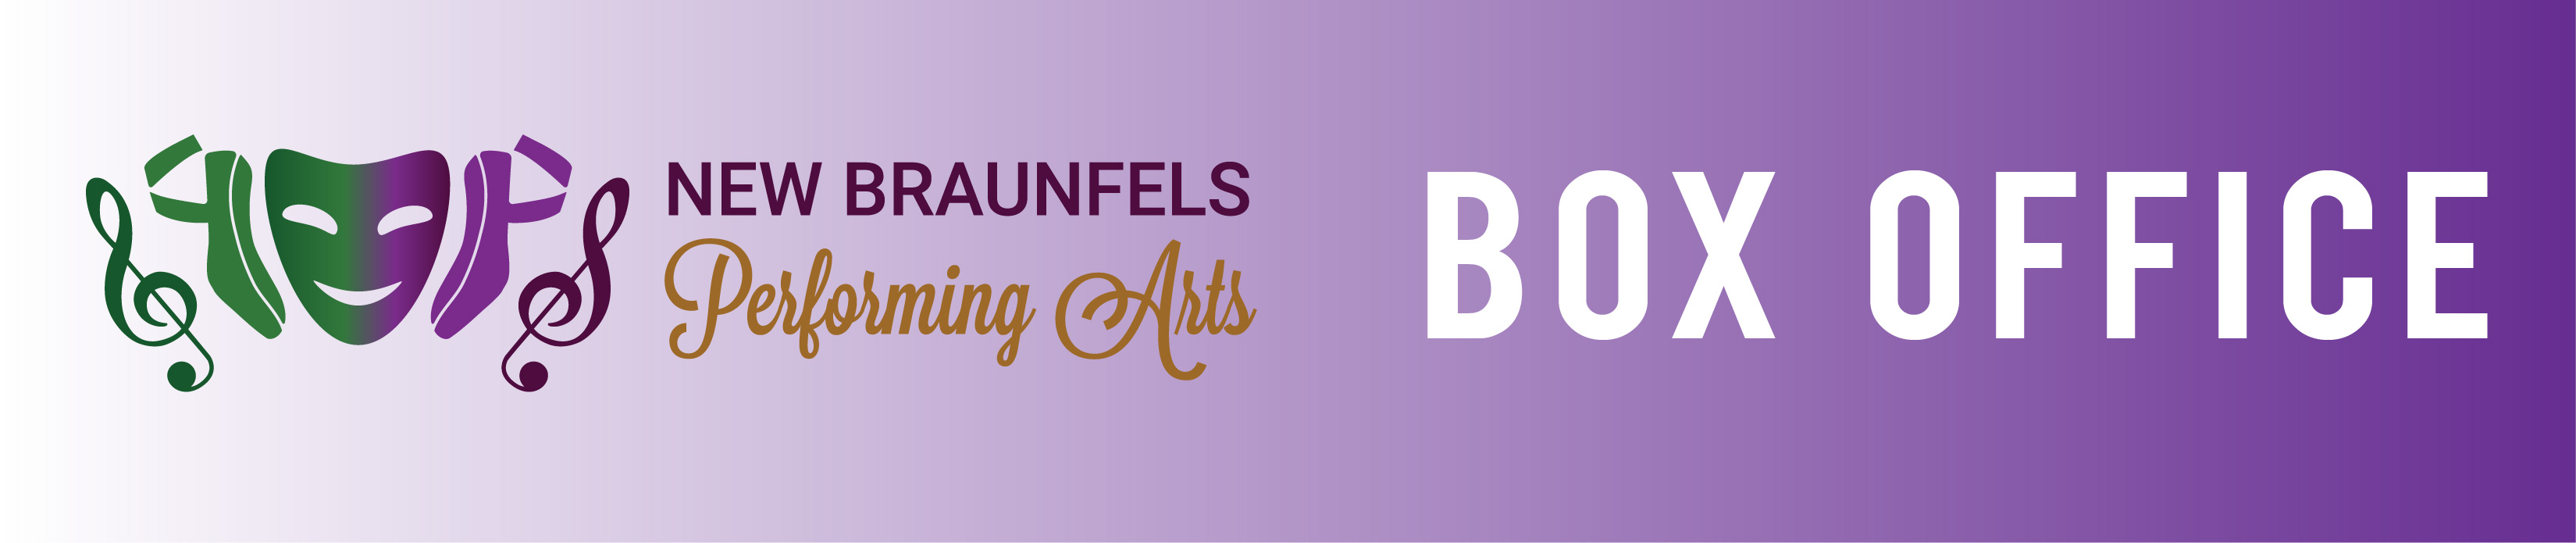 New Braunfels Performing Arts  Box Office